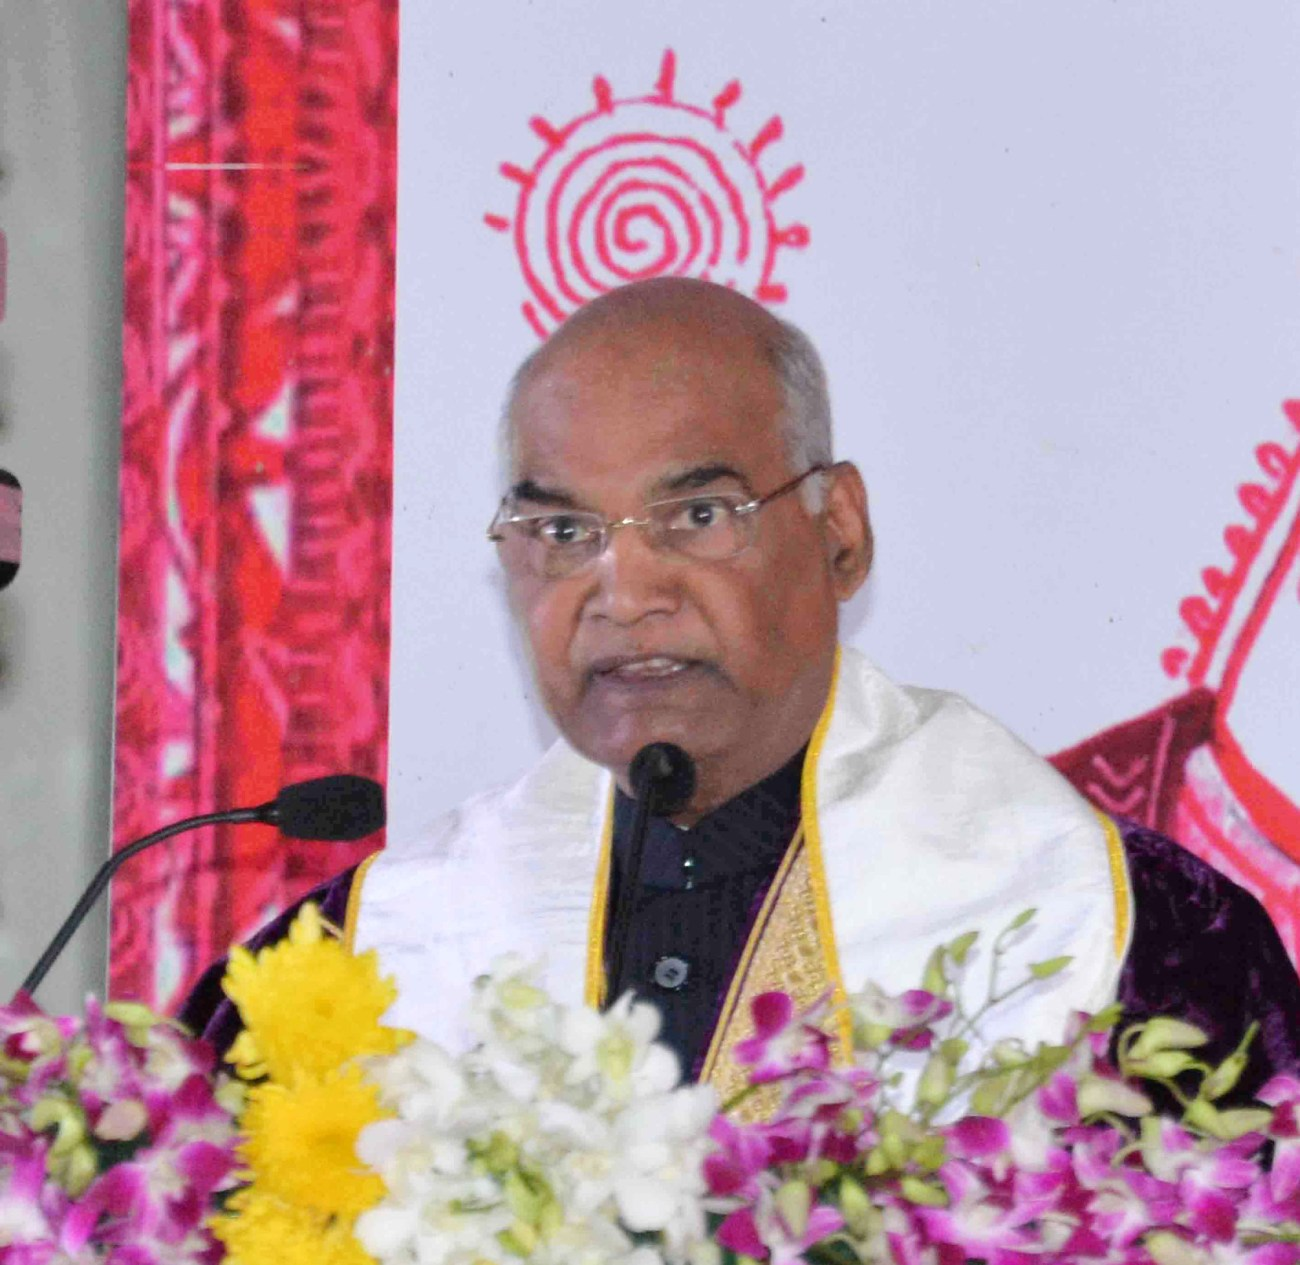 The President, Shri Ram Nath Kovind addressing at the first convocation of the AIIMS, at Rishikesh, in Uttarakhand on November 03, 2018-PIB